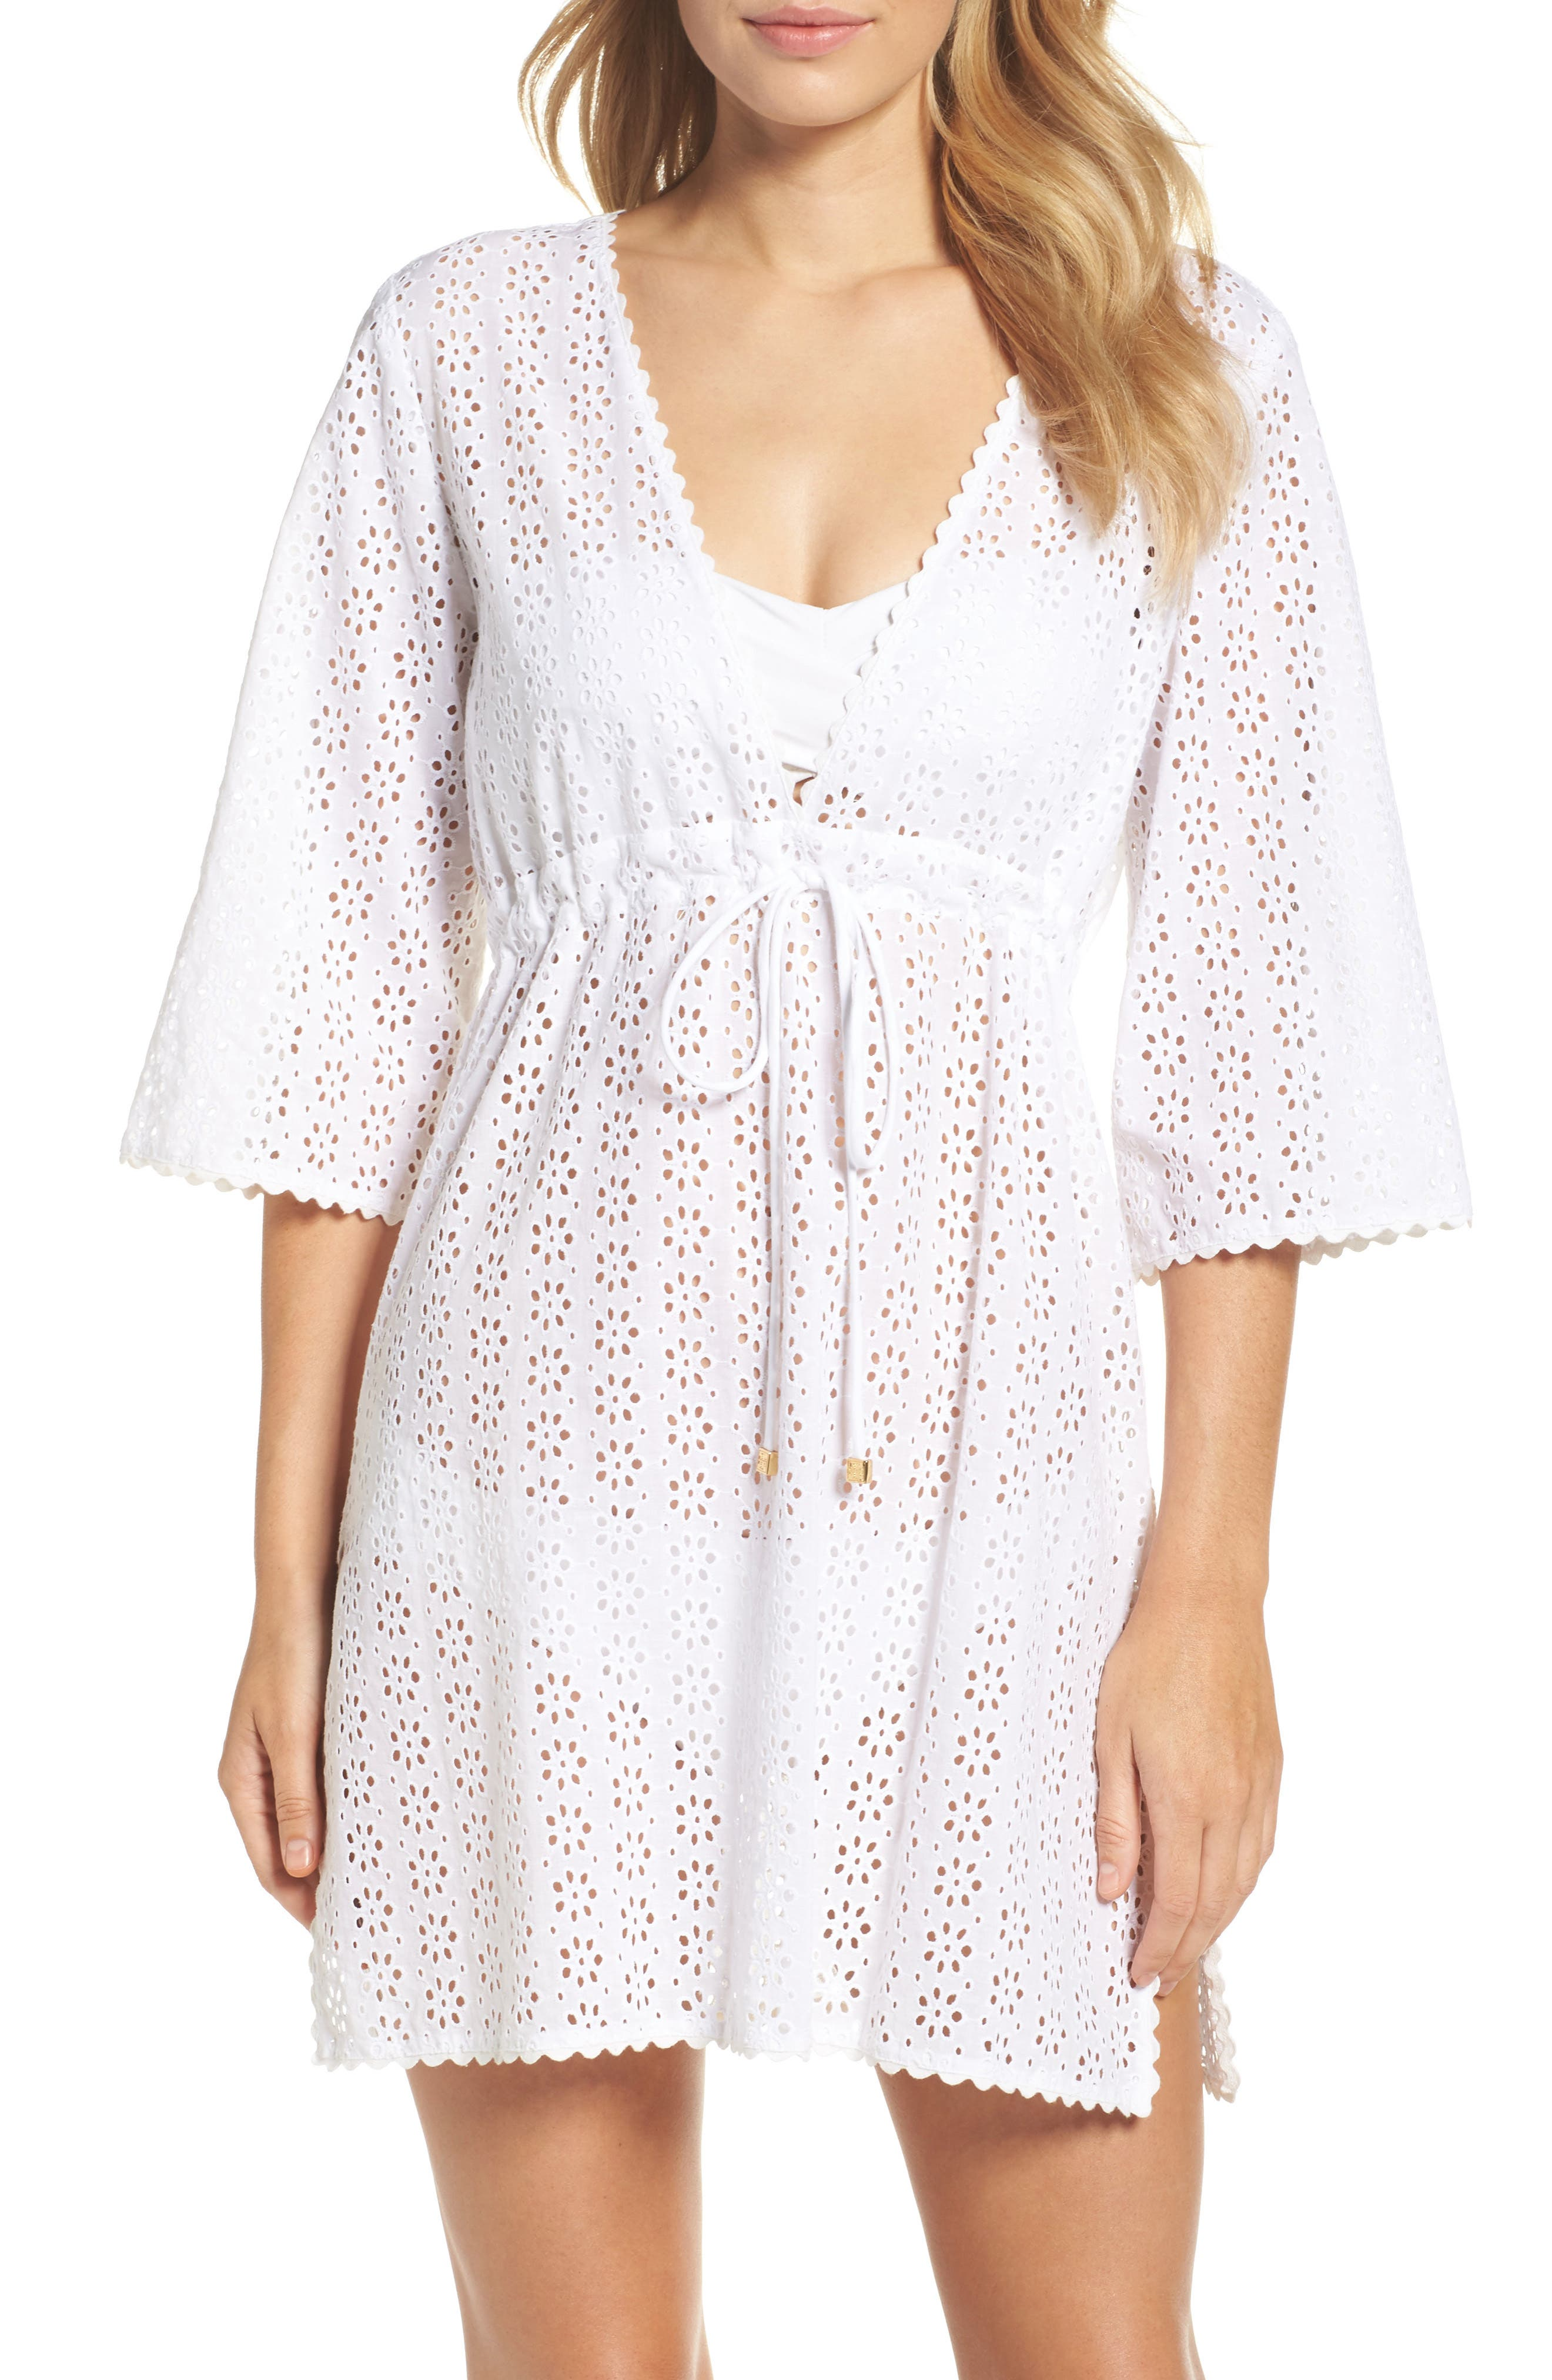 Broderie Anglais Cover-Up Dress,                         Main,                         color, 100